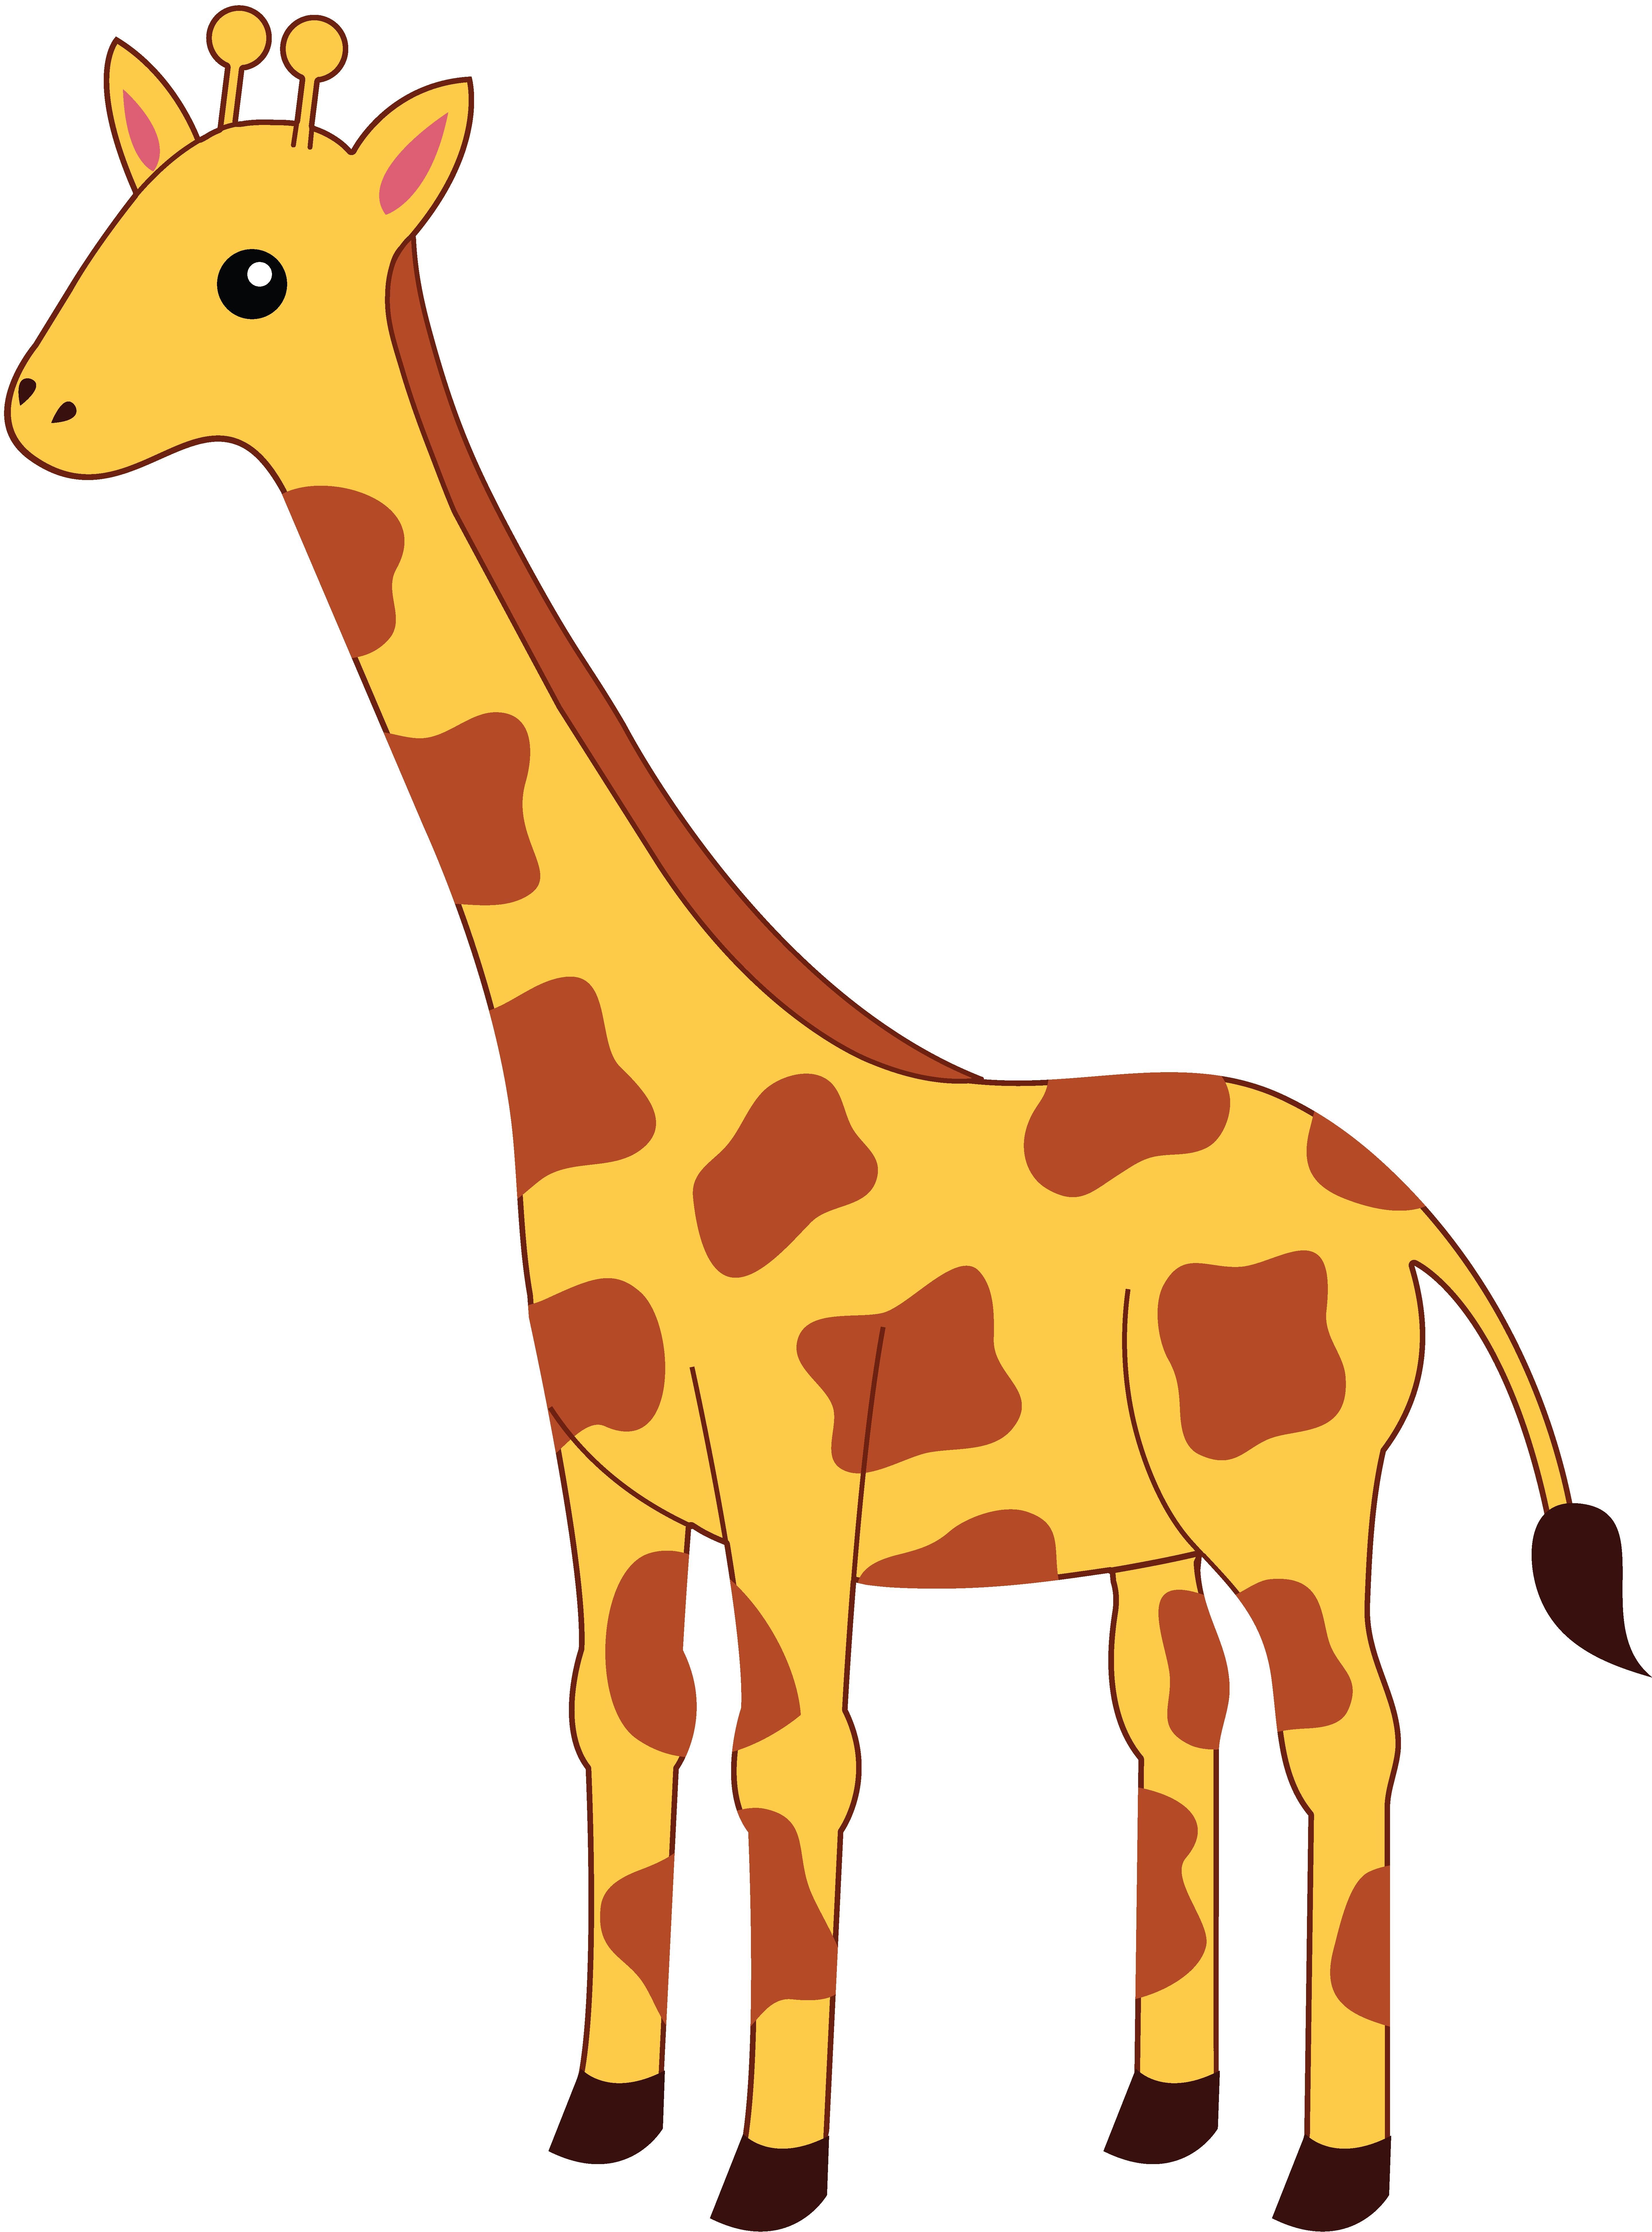 Baby panda free images. Clipart giraffe skin